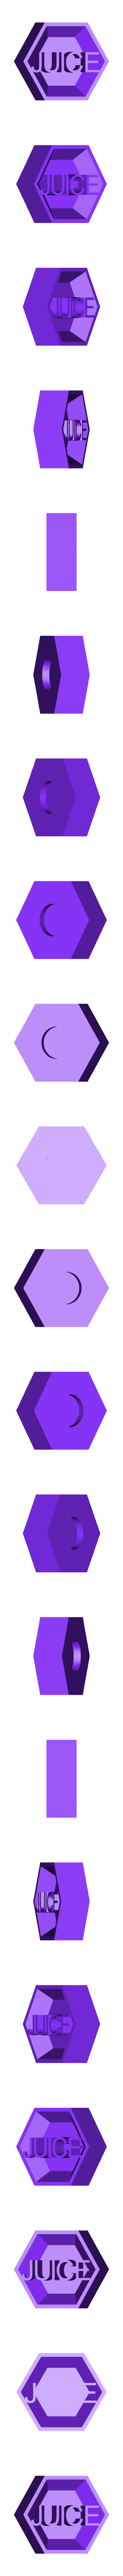 JUICE.stl Download free STL file Busy Bee • Object to 3D print, WallTosh